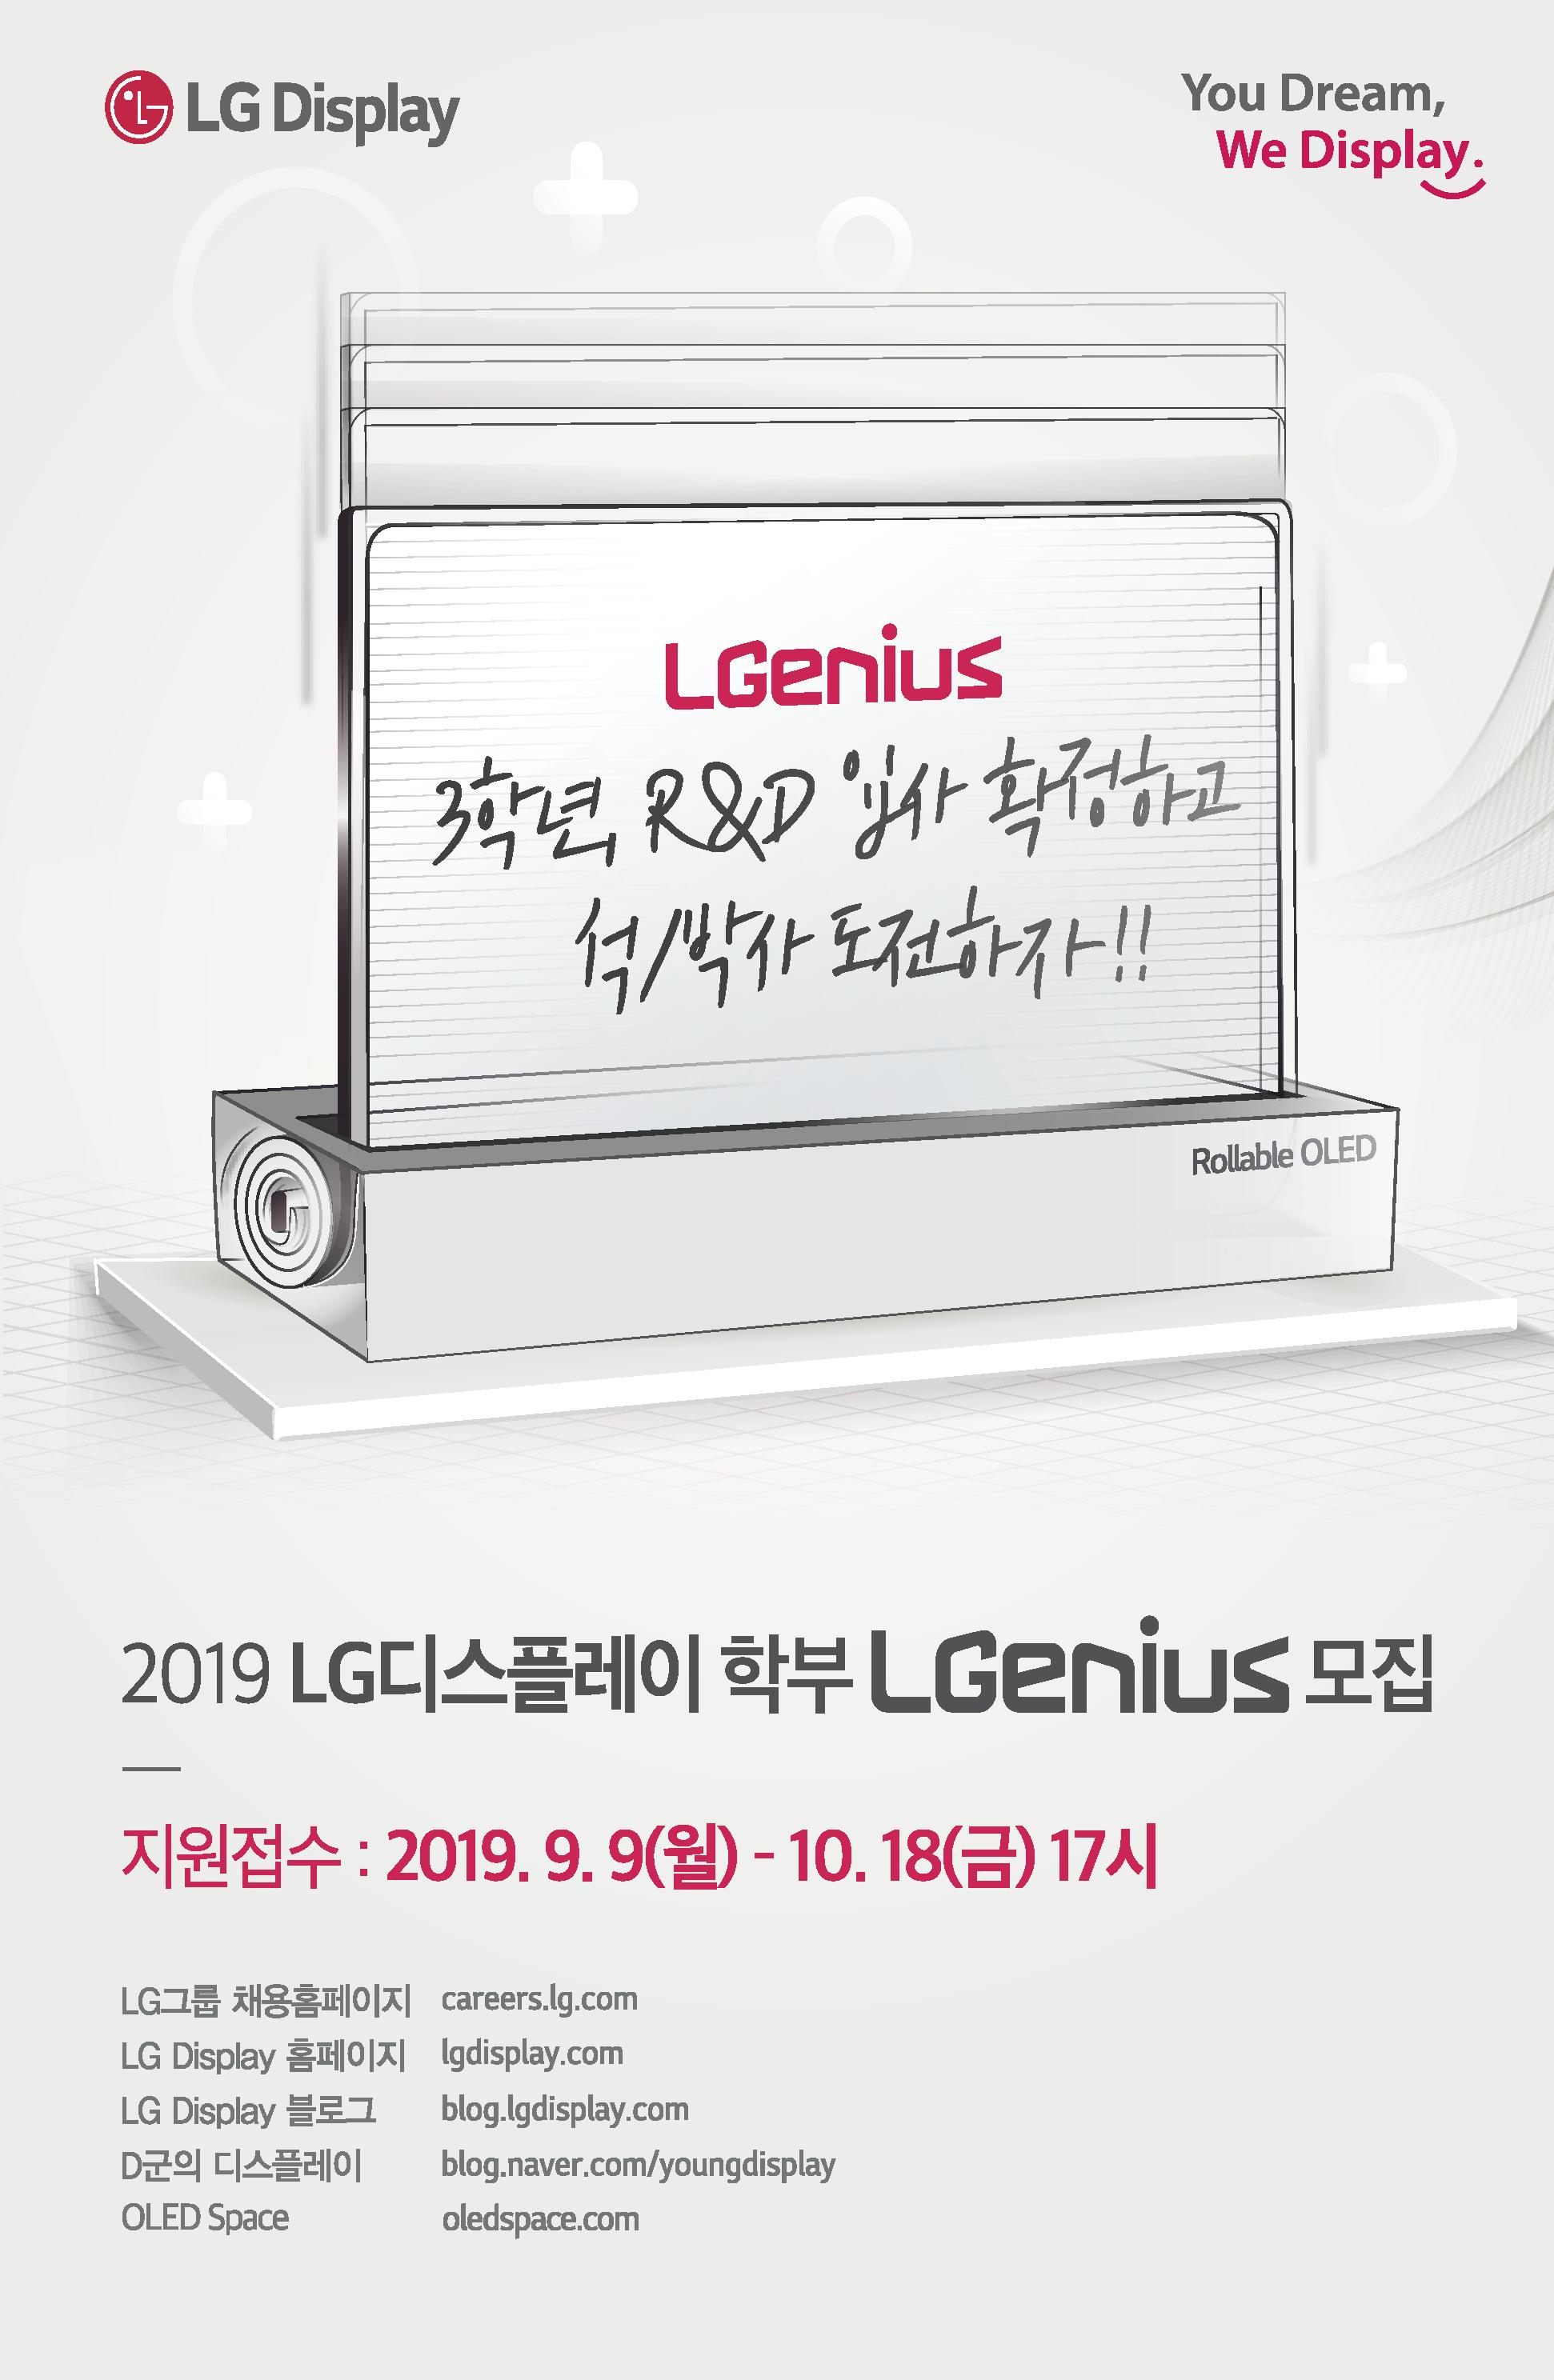 19_LG Display_LGenius(모집요강)_페이지_1.png